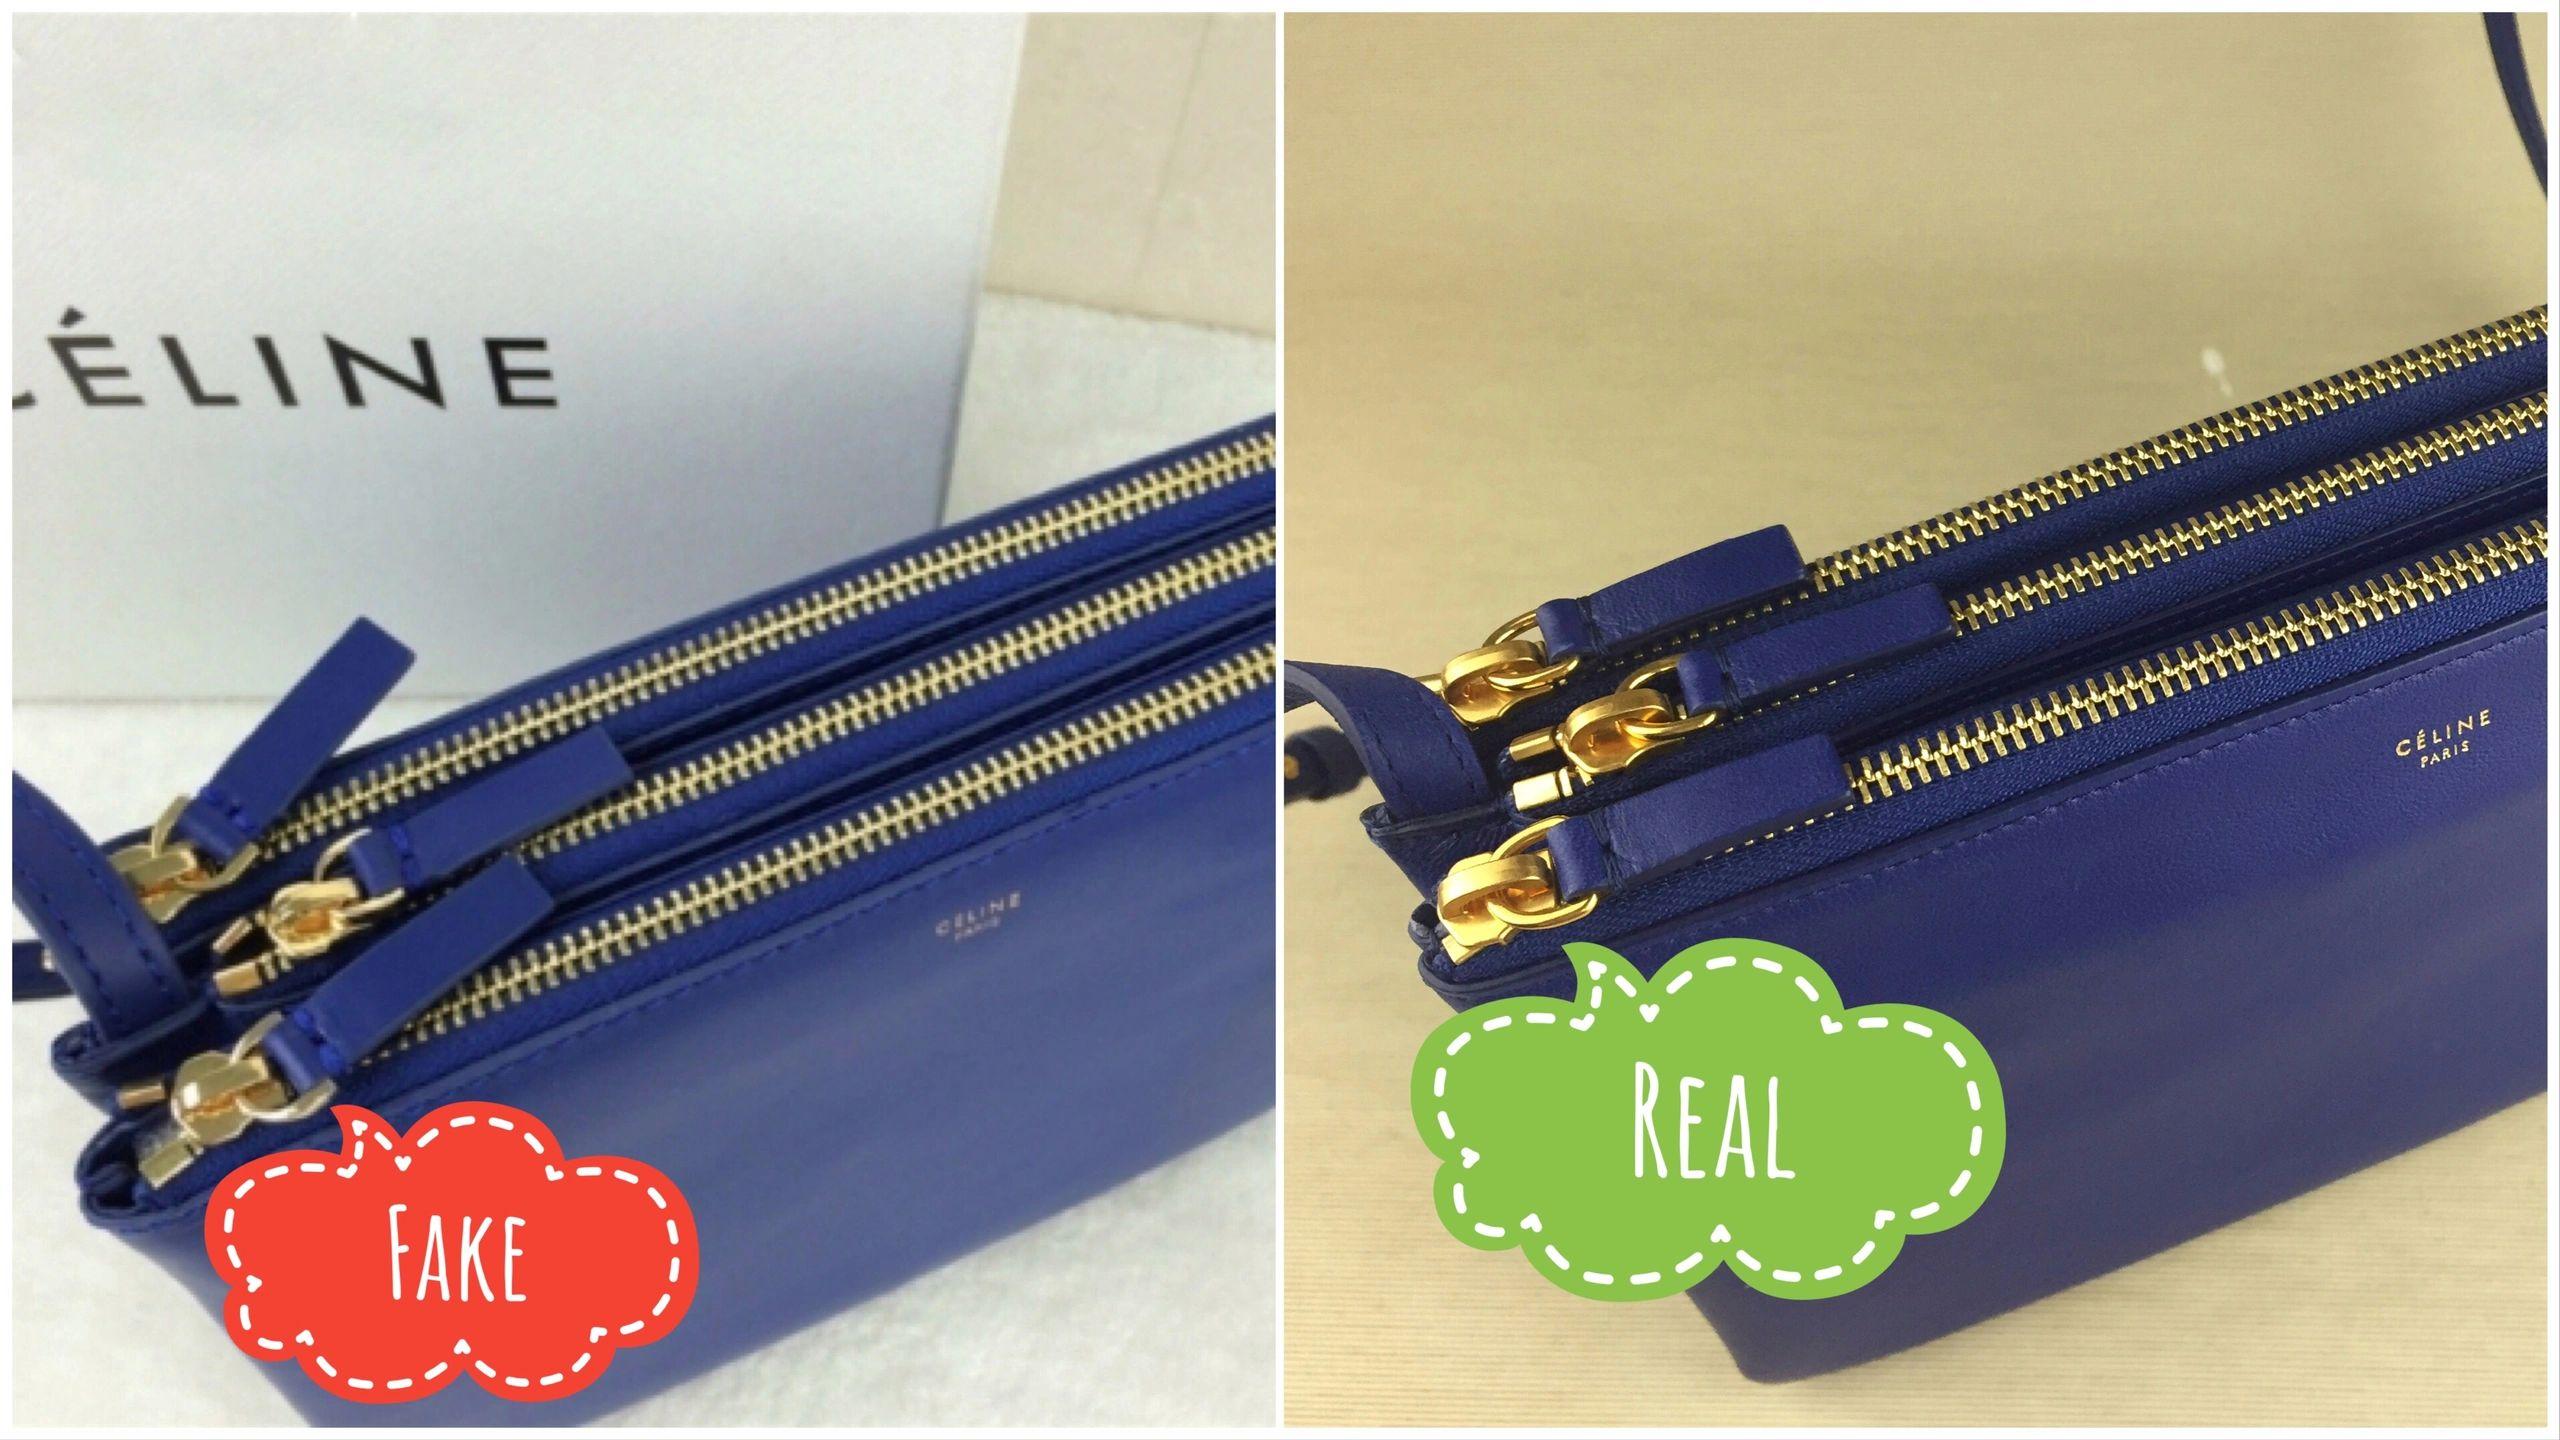 b2472d45e4 CELINE handbags authenticity guide - MONALISALIKES